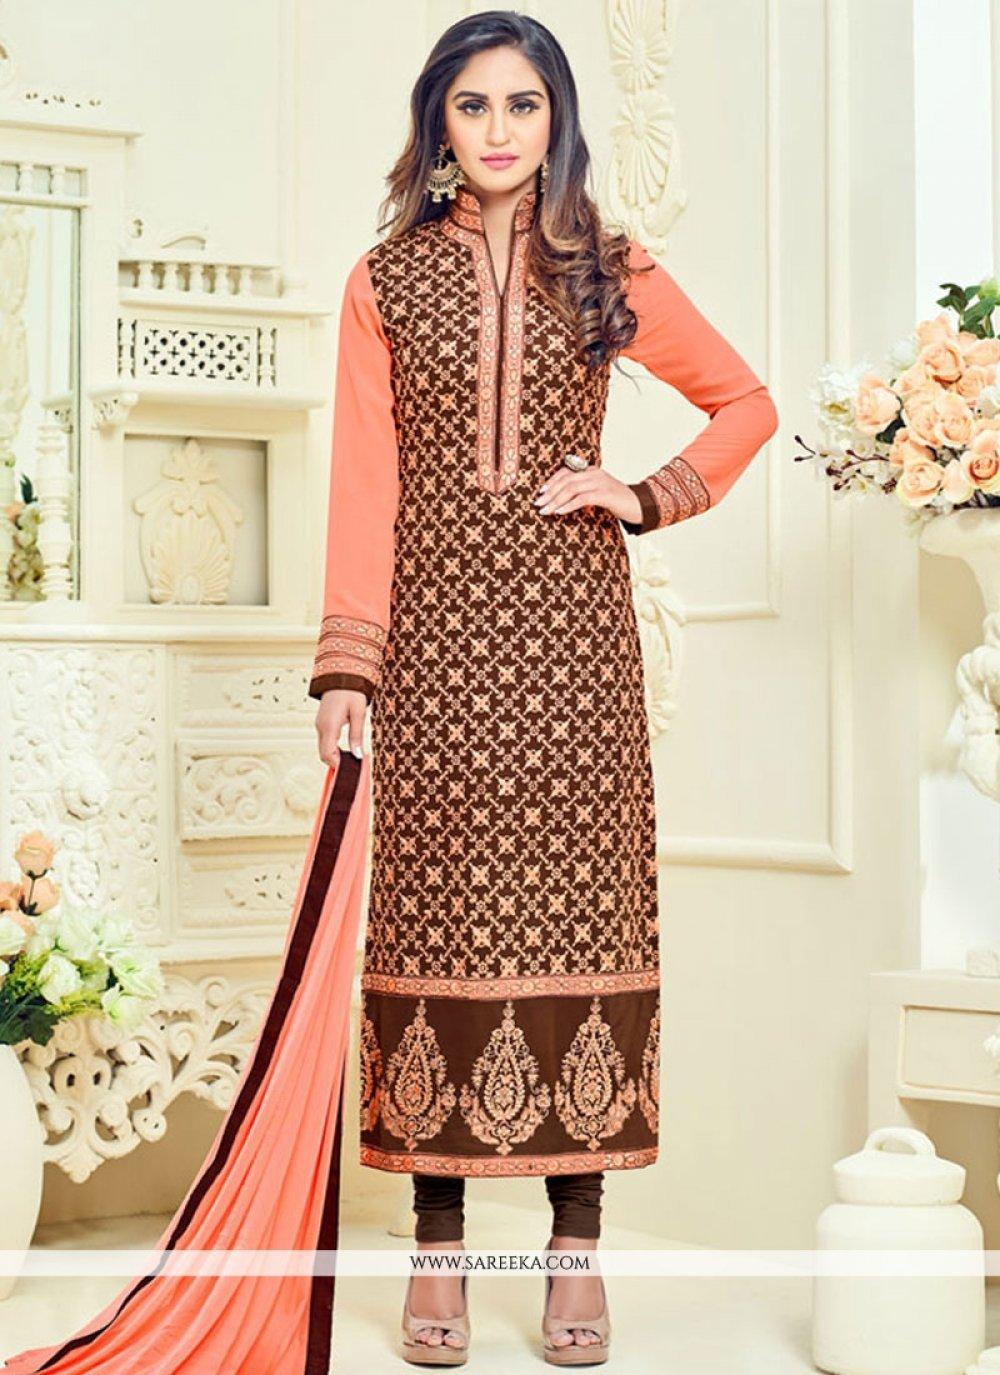 Krystle Dsouza Embroidered Work Brown Churidar Designer Suit